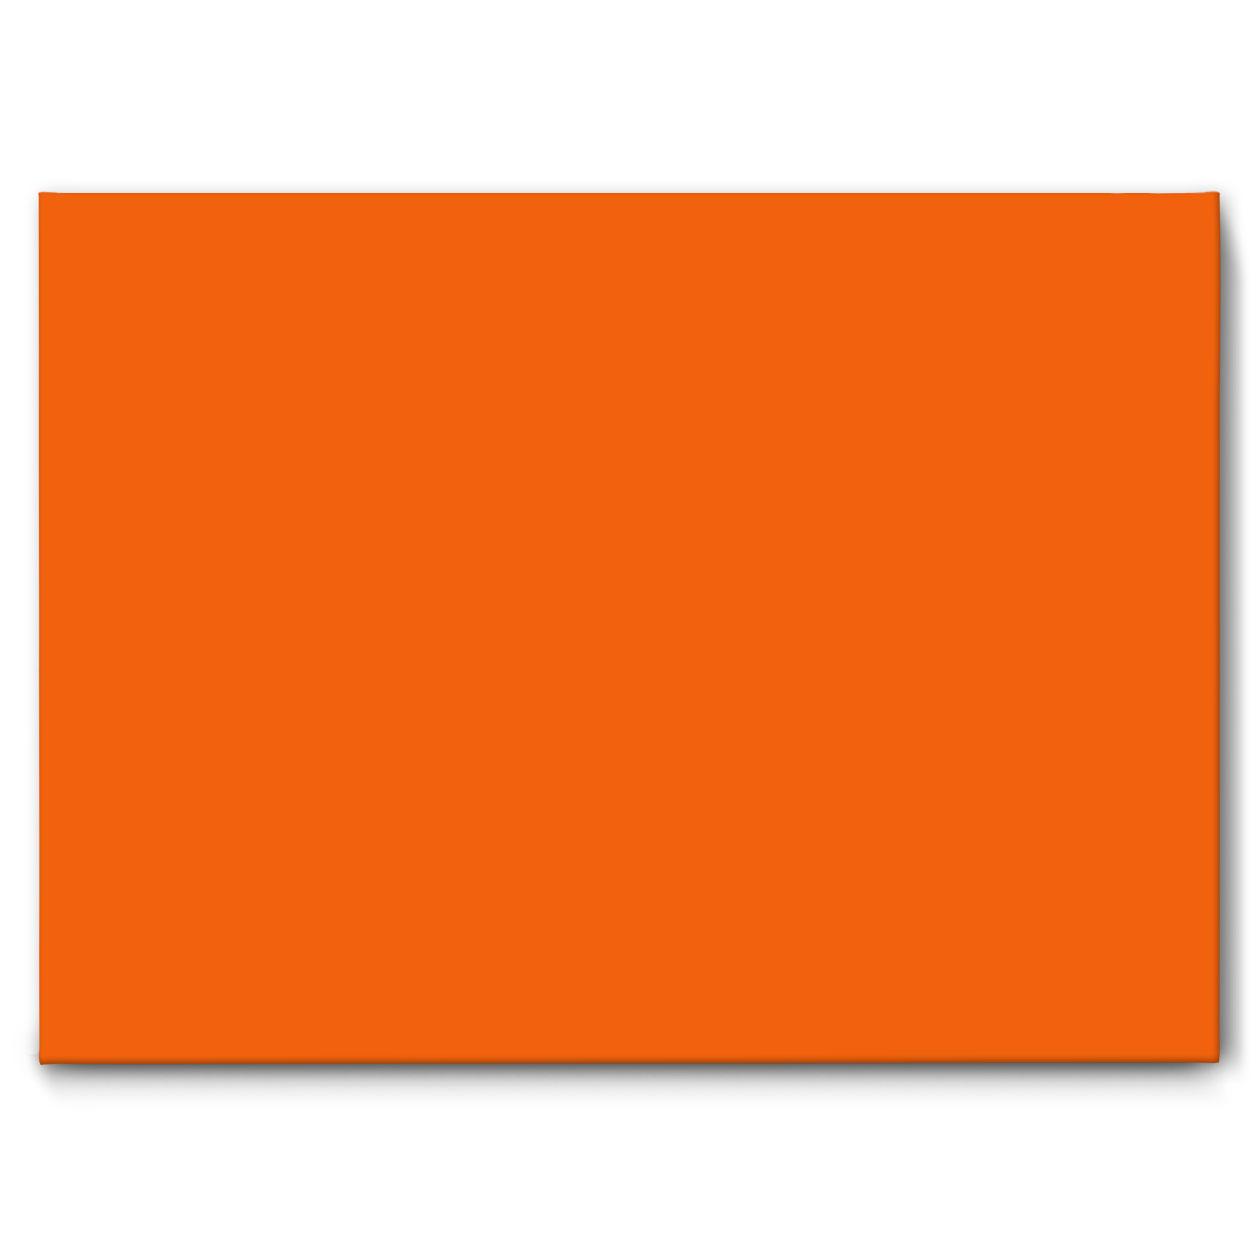 Korall Farbe korall farbe frauen koralle kleid junge formula farbe mit